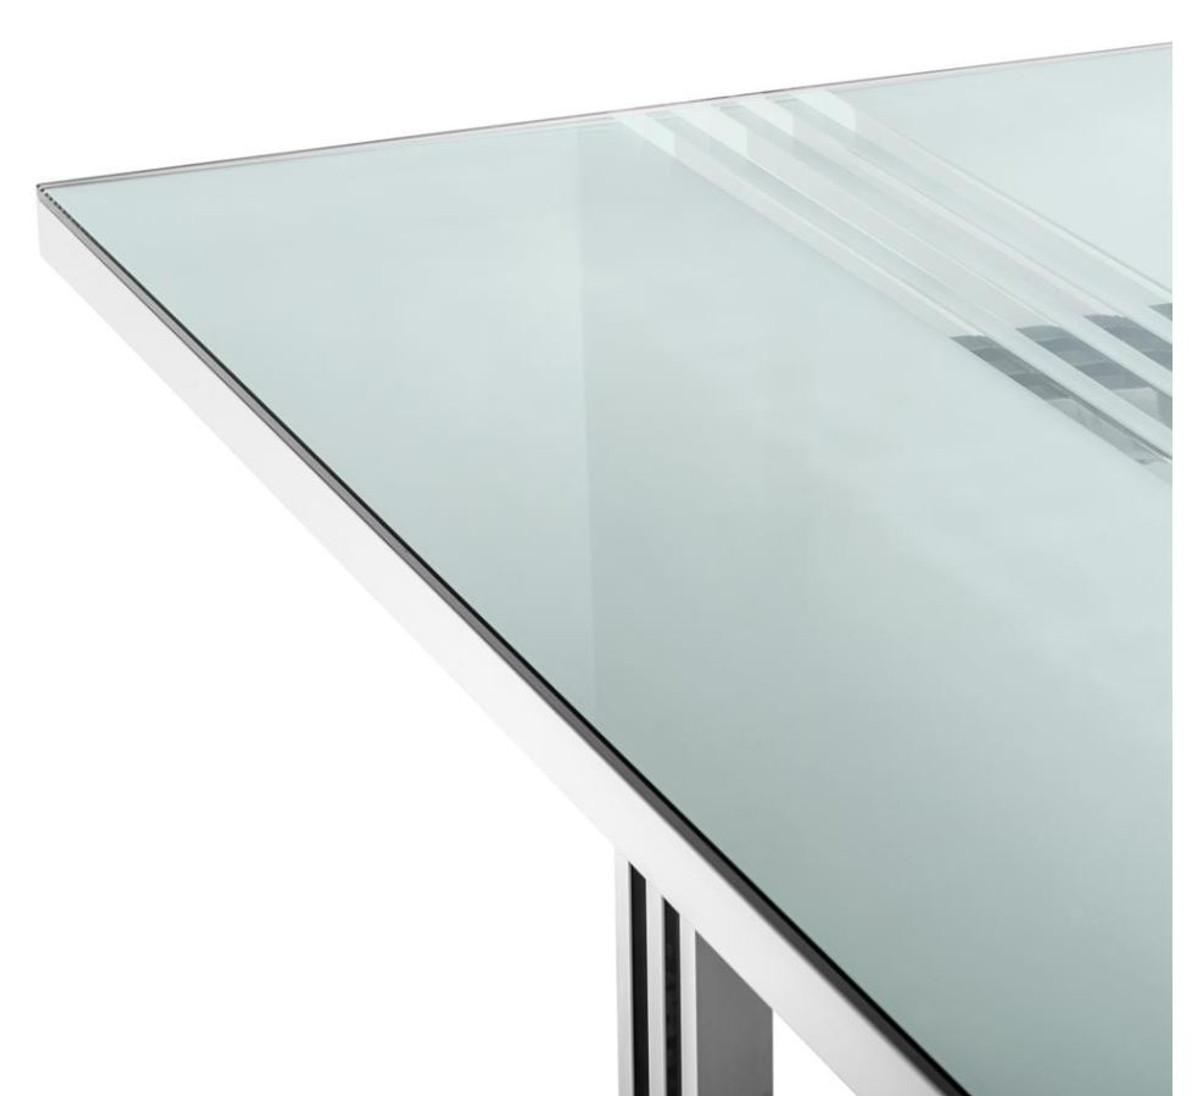 casa padrino luxus esstisch 210 x 96 x h 76 cm designer. Black Bedroom Furniture Sets. Home Design Ideas